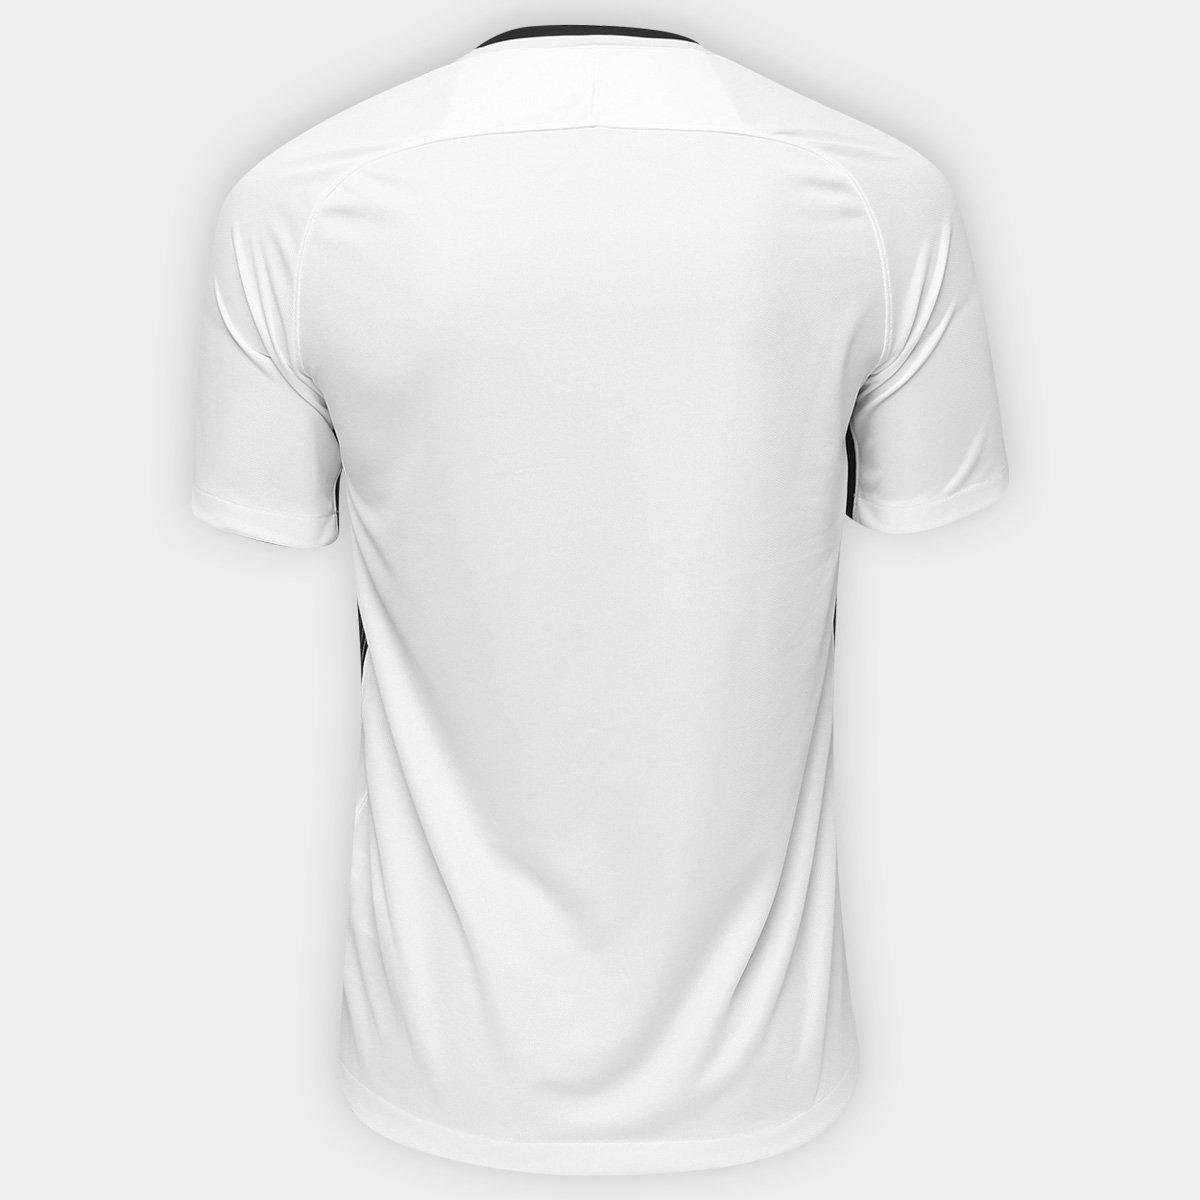 39ce0eae5f Camisa Corinthians I 17 18 s nº Torcedor Nike Masculina - Compre ...